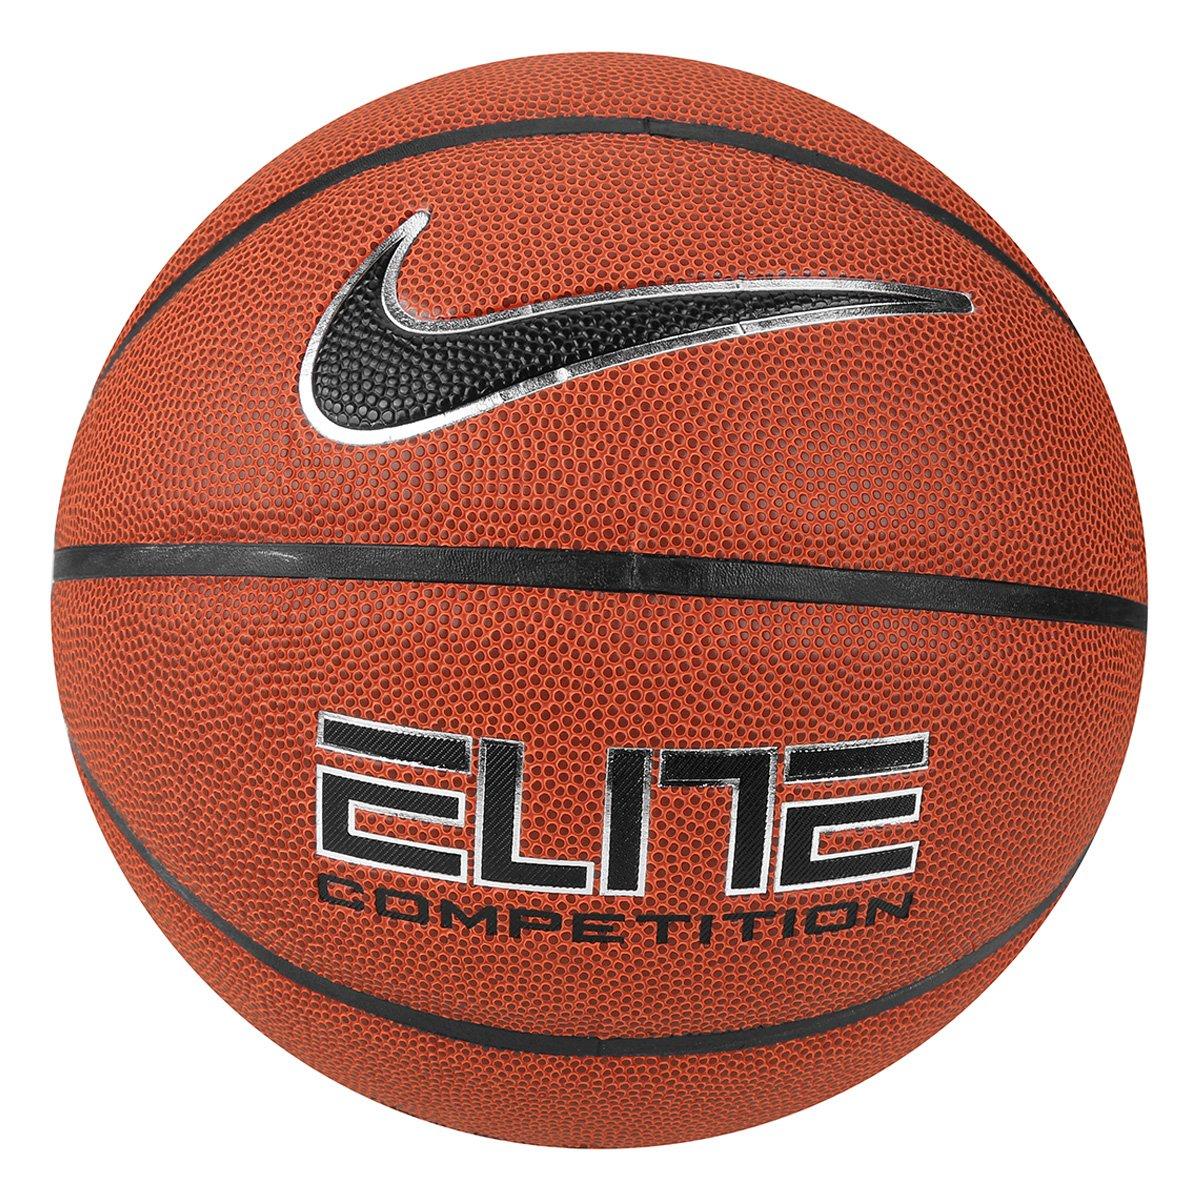 Bola Basquete Nike Elite Competition 8P Tam 7